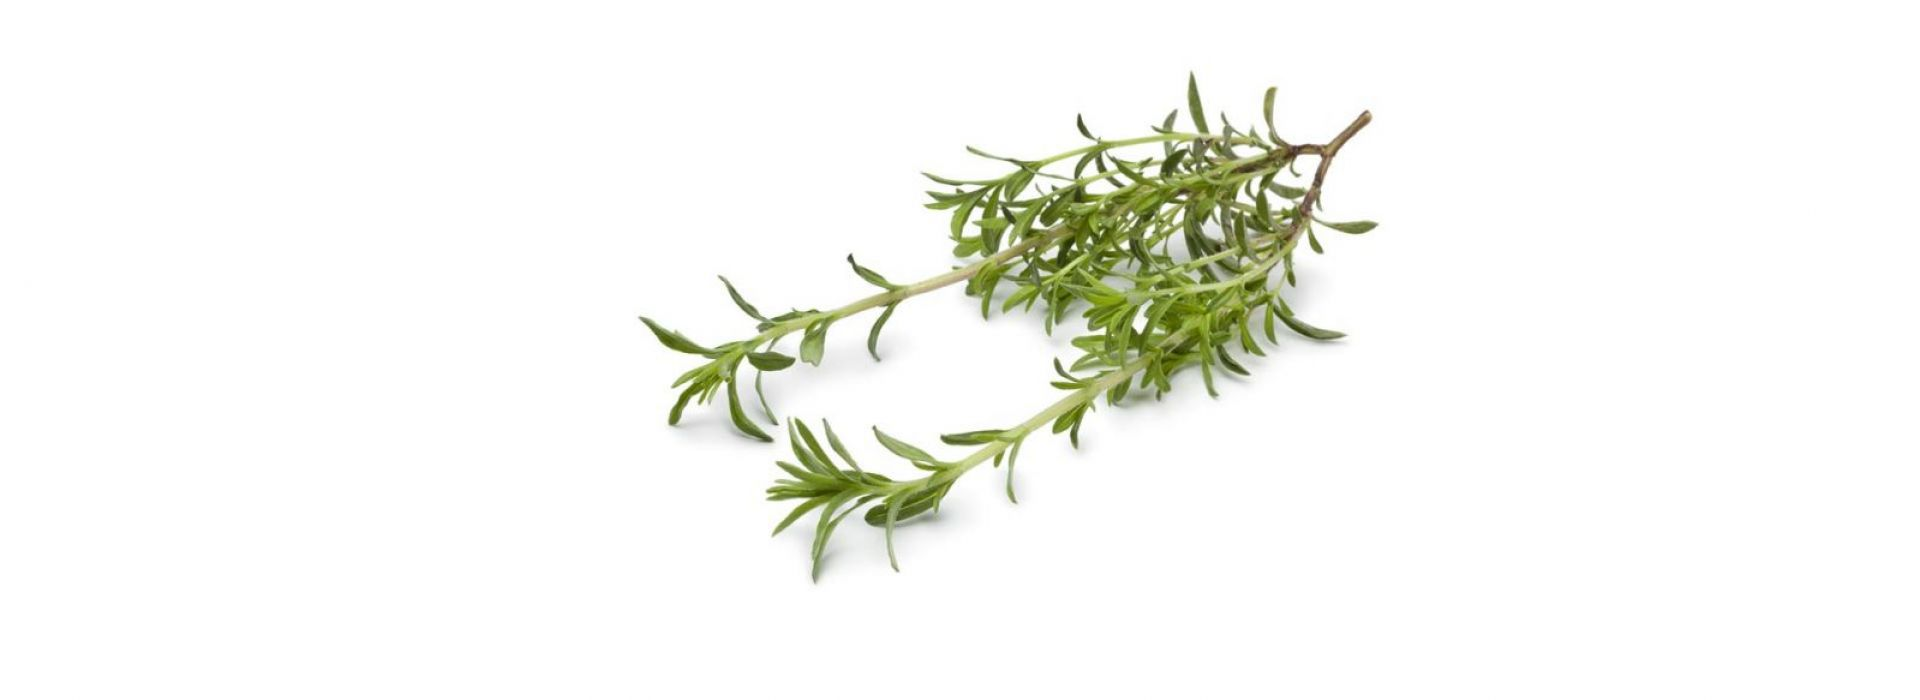 Herb Savory